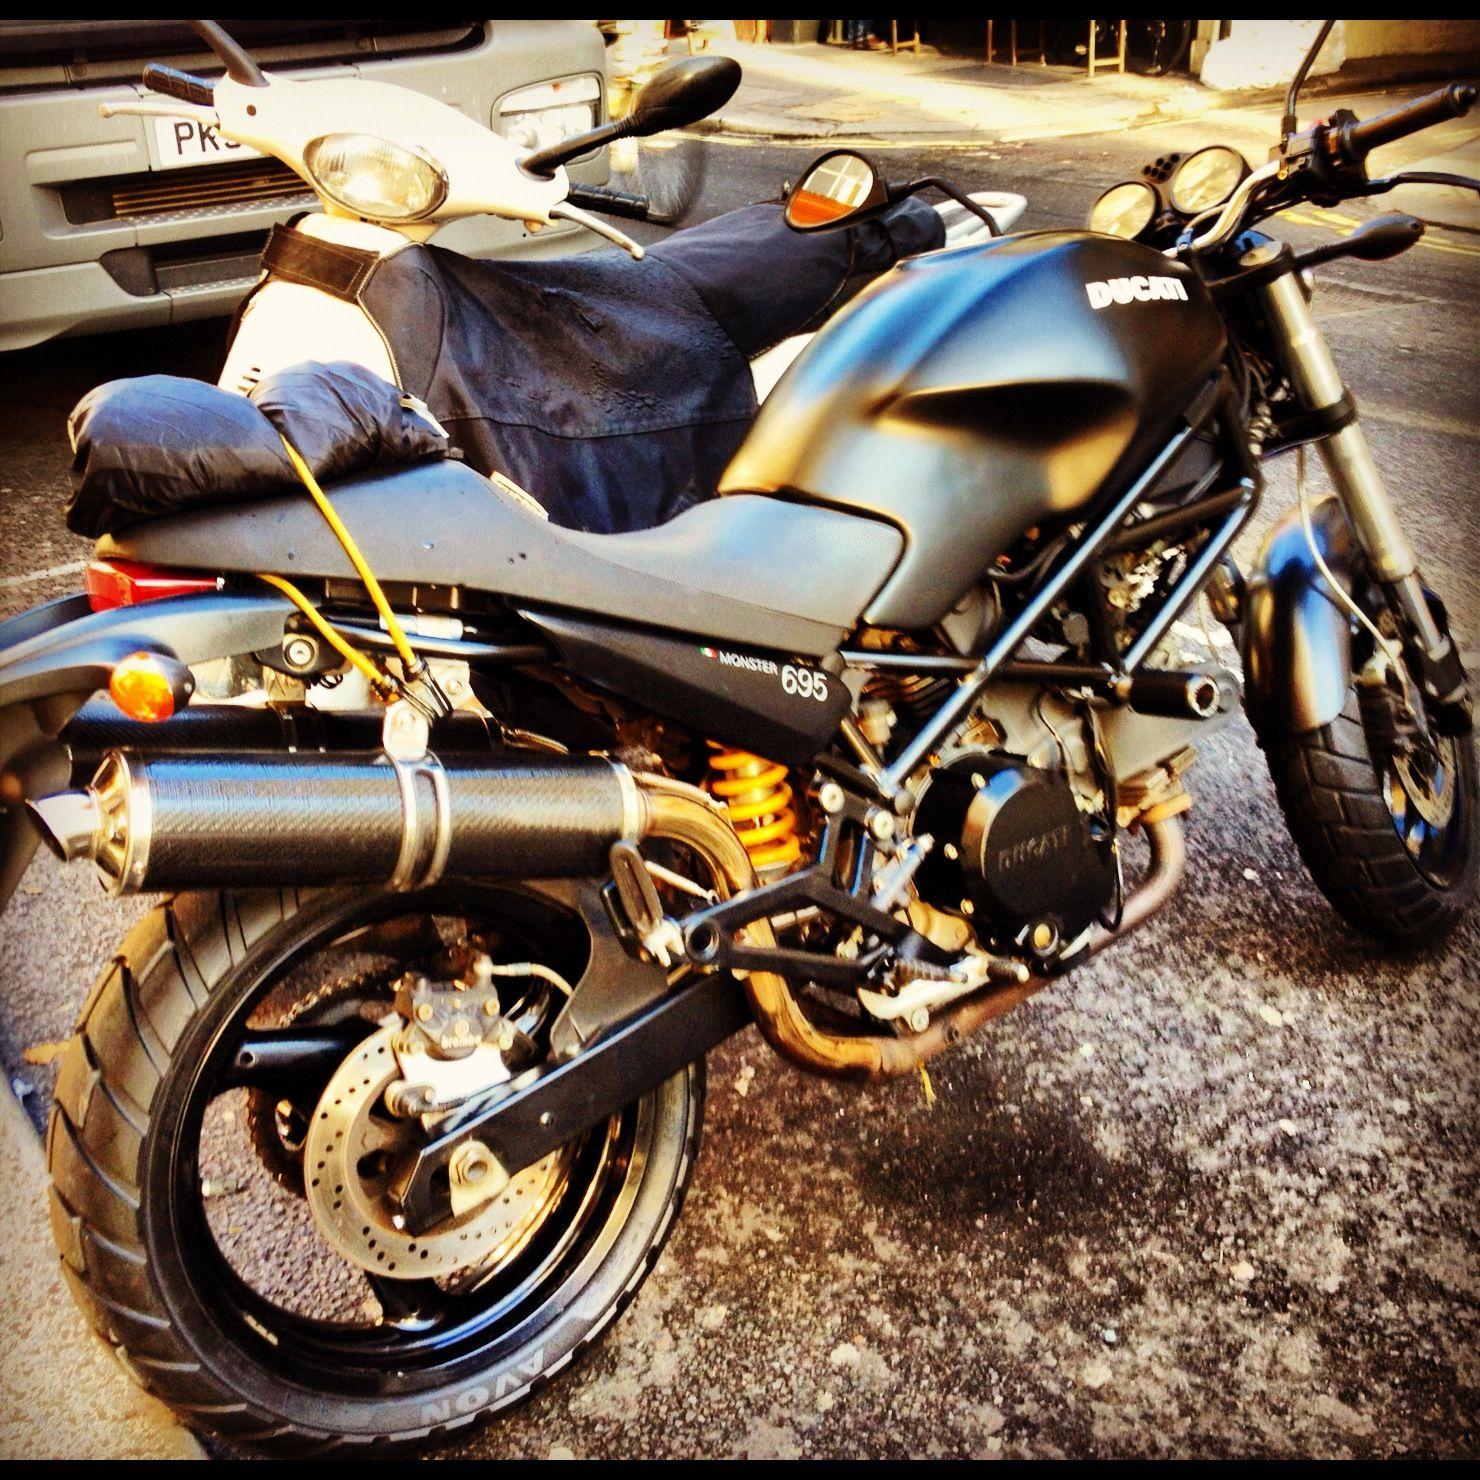 My Ducati Scrambler Ducati Ducati Scrambler Motorcycle